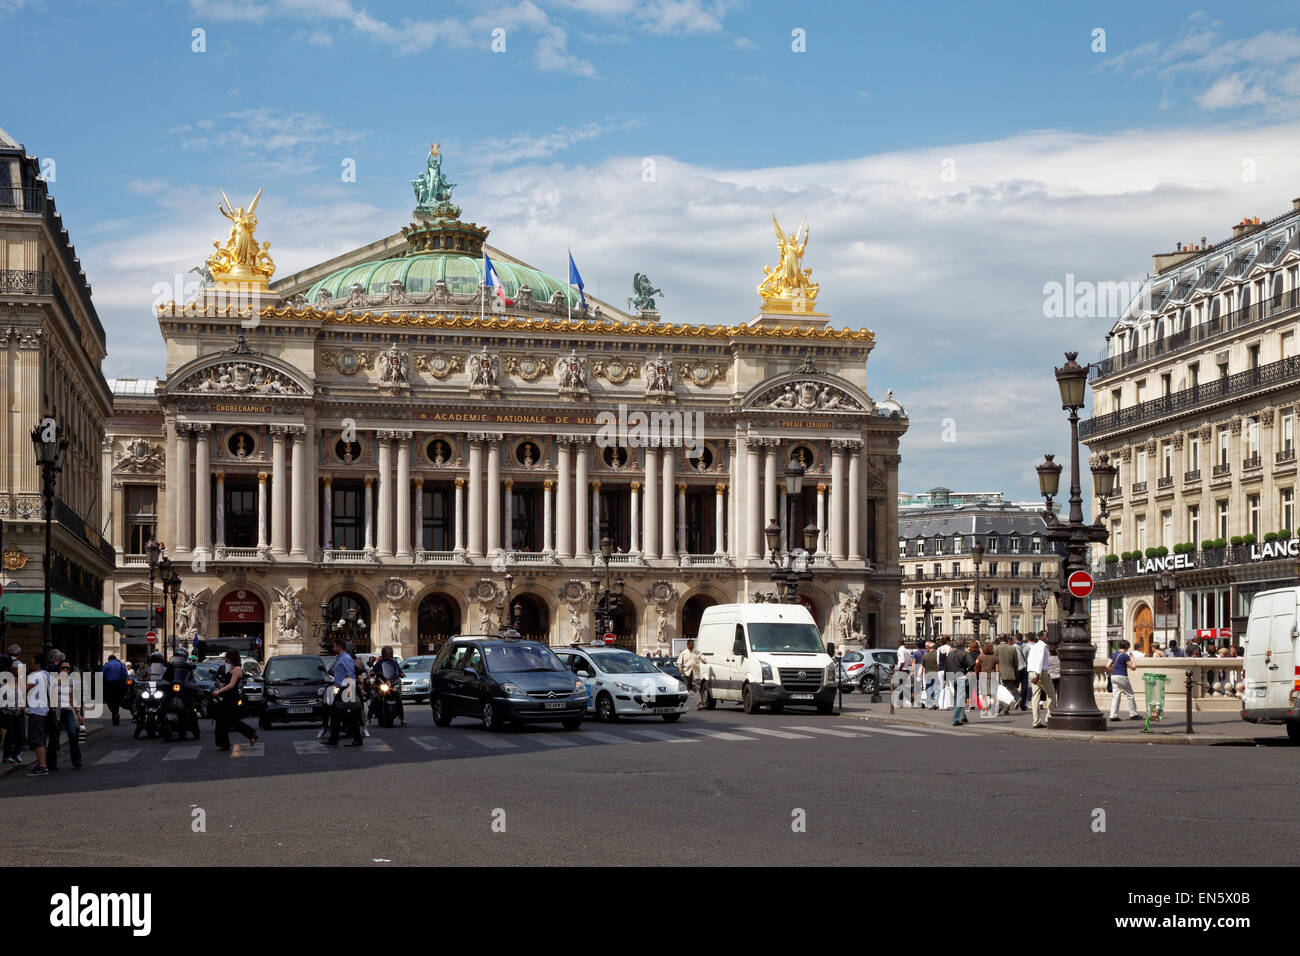 Paris Opéra, Palais Garnier, Opéra de Paris or Opéra Garnier, Paris Academie Nationale De Musique, - Stock Image